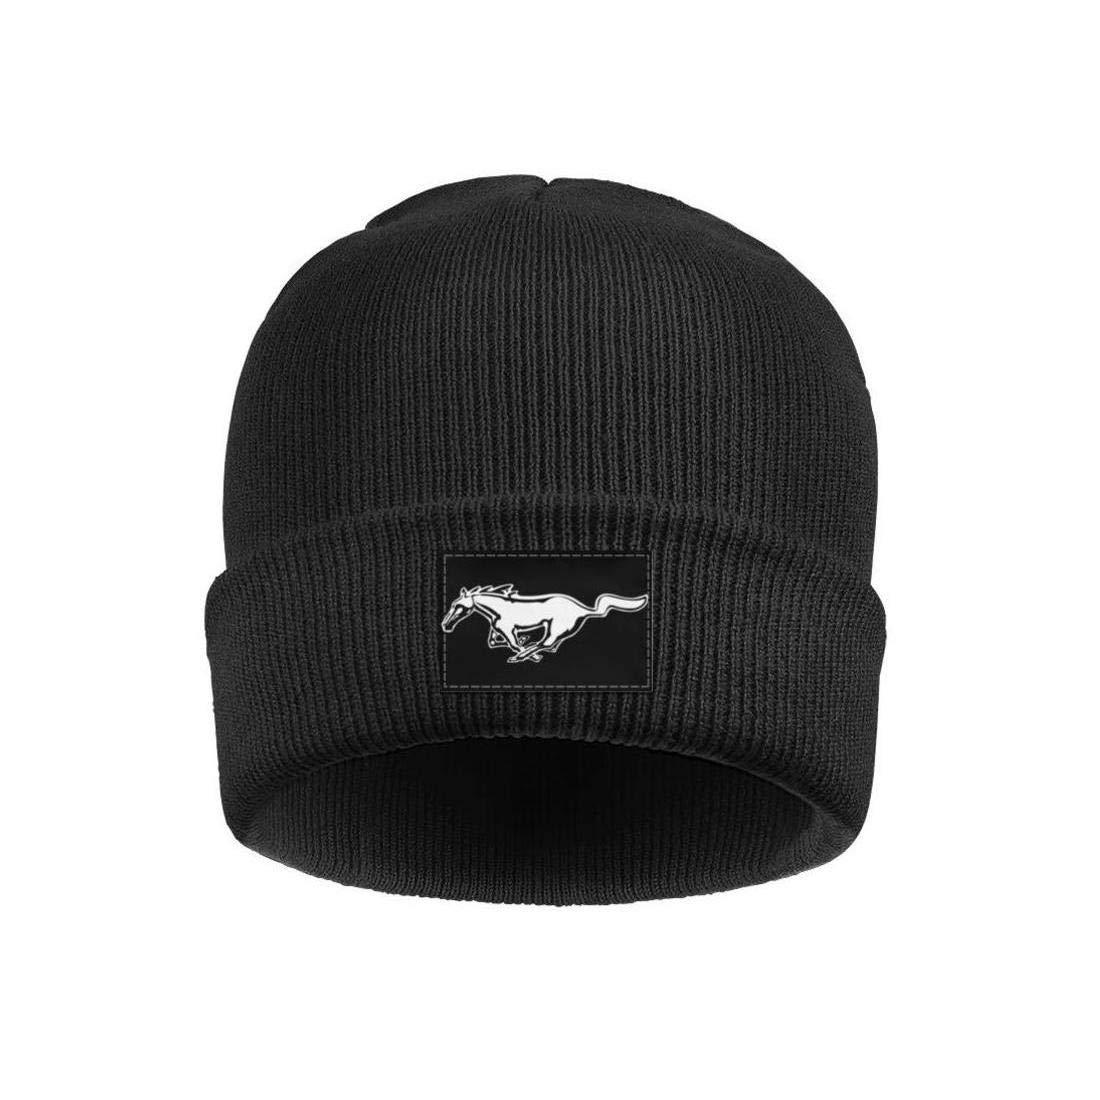 Mens Ford-Mustang-Logo Wool Beanie Cap Knit Caps Fine Knit Beanie HatsStretchy /& Soft